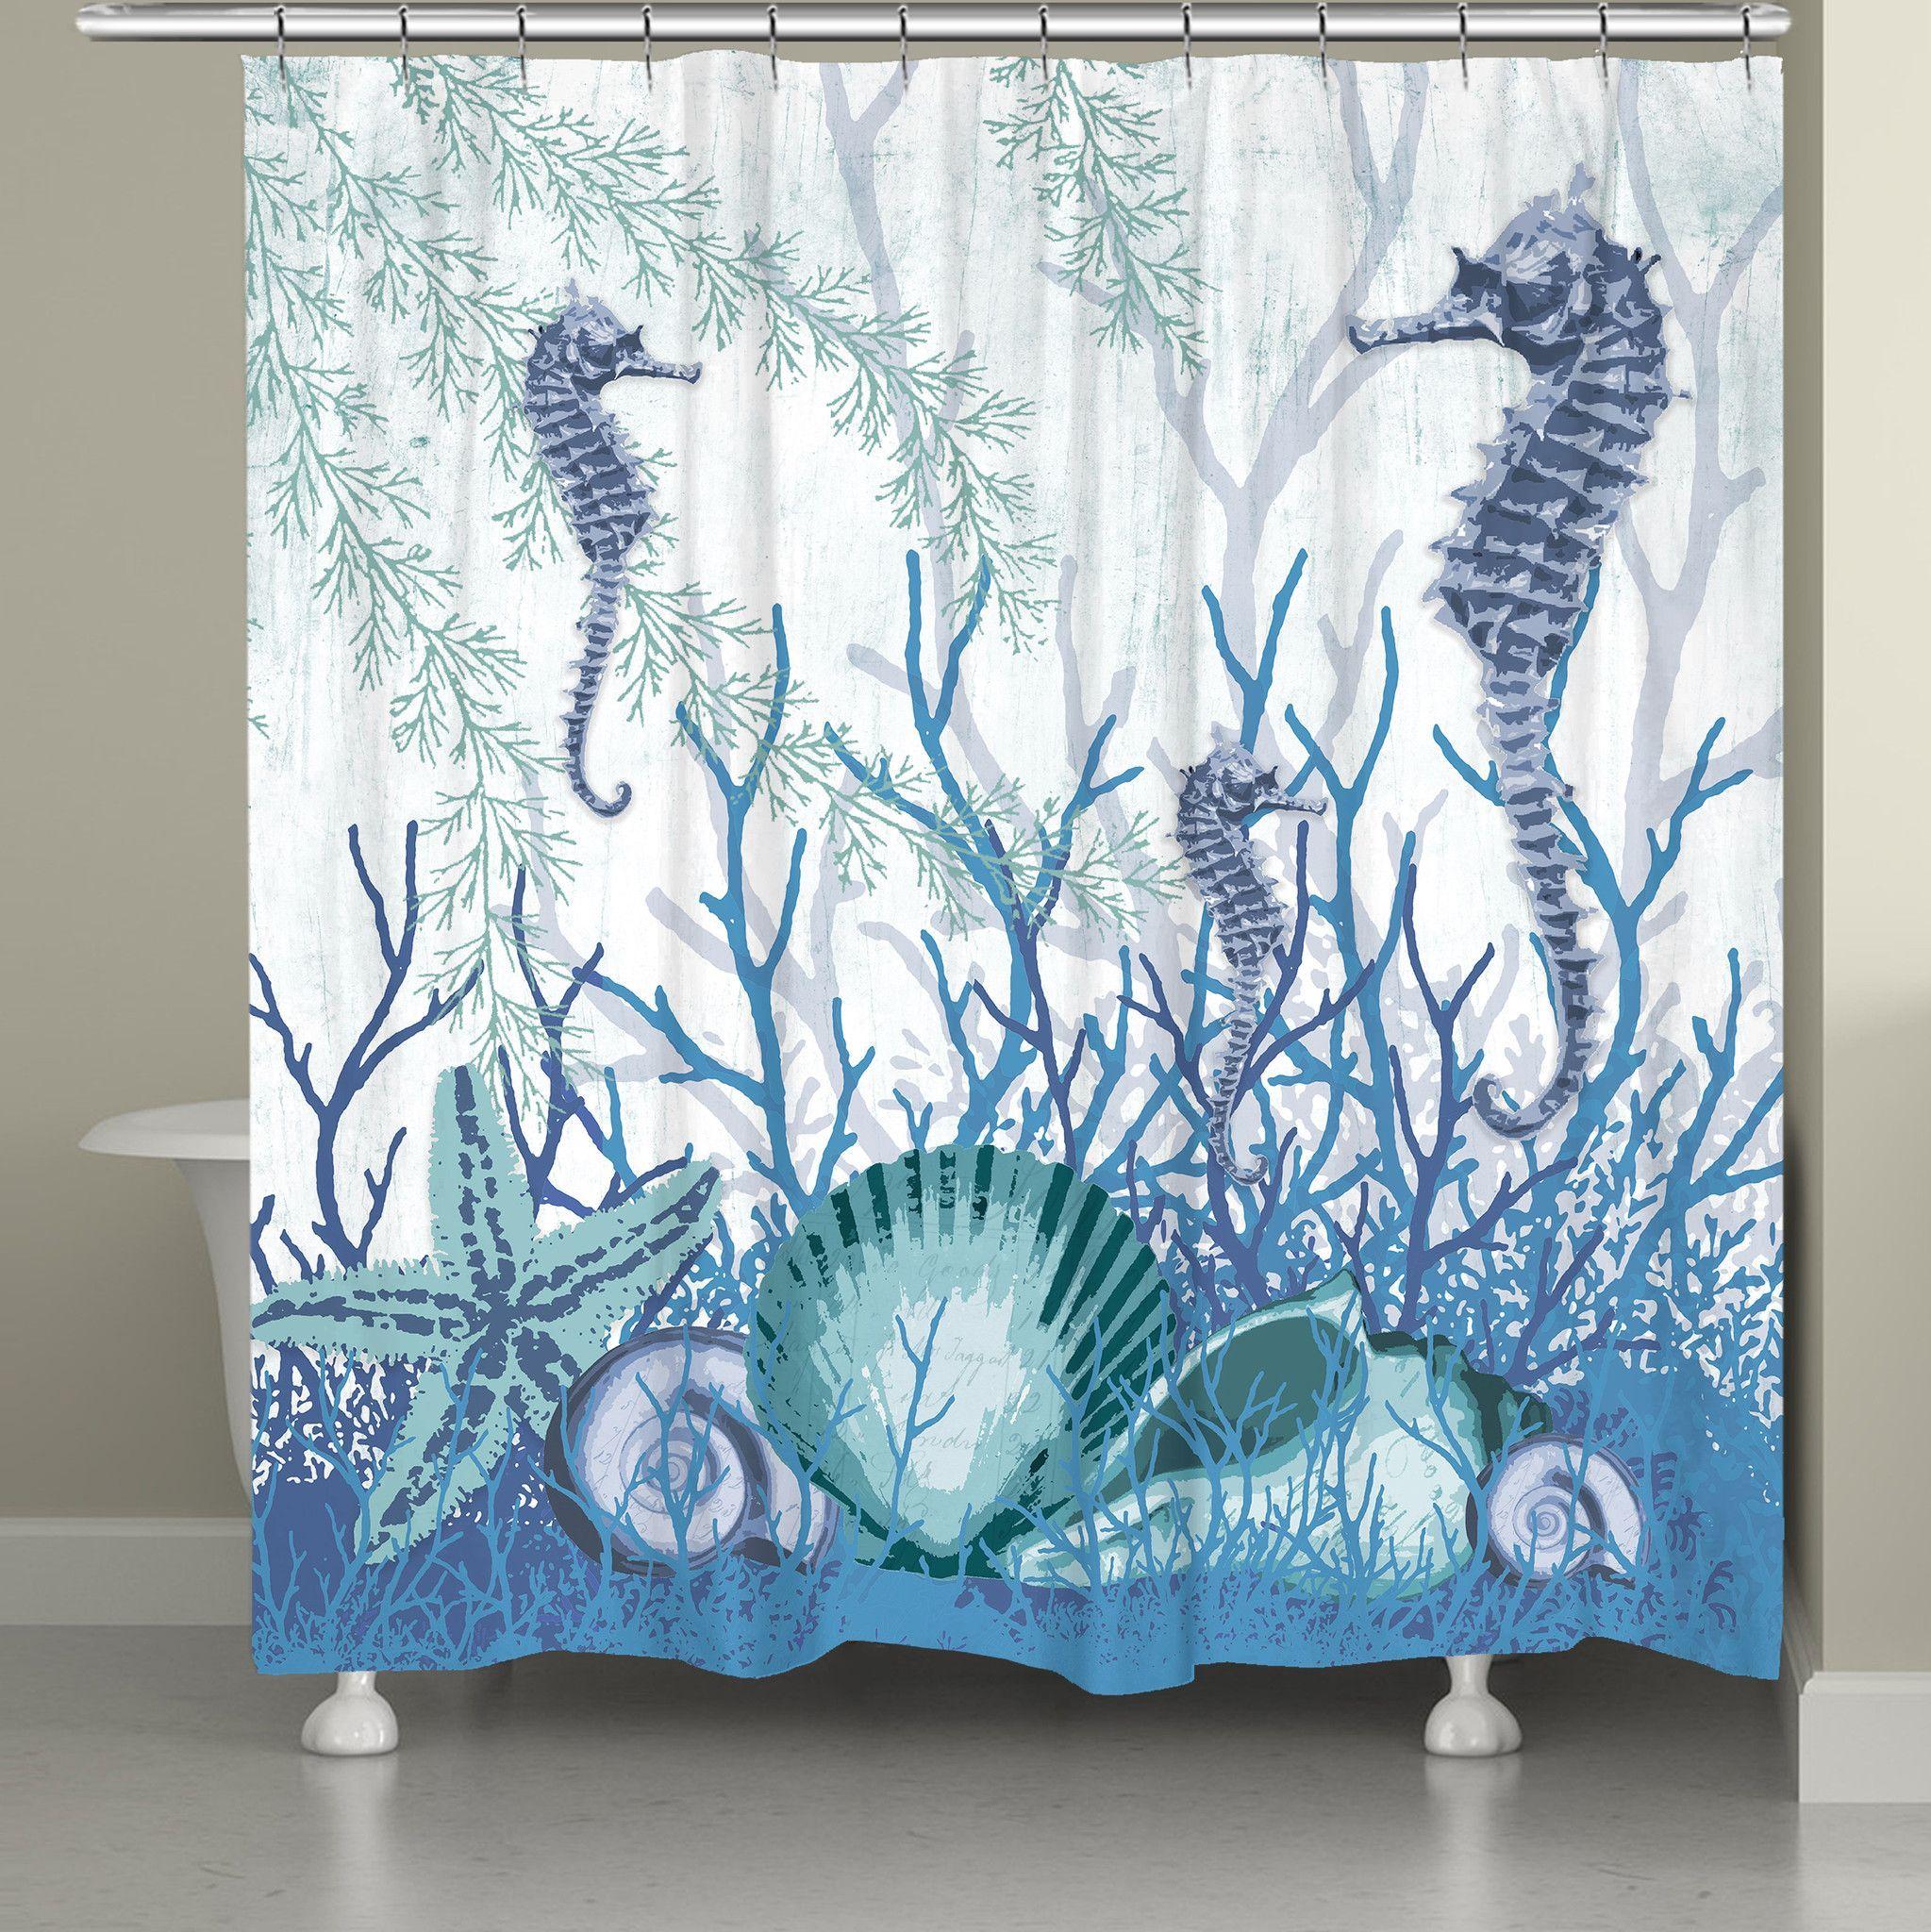 Aquatic Seahorses and Sea Shells Shower Curtain